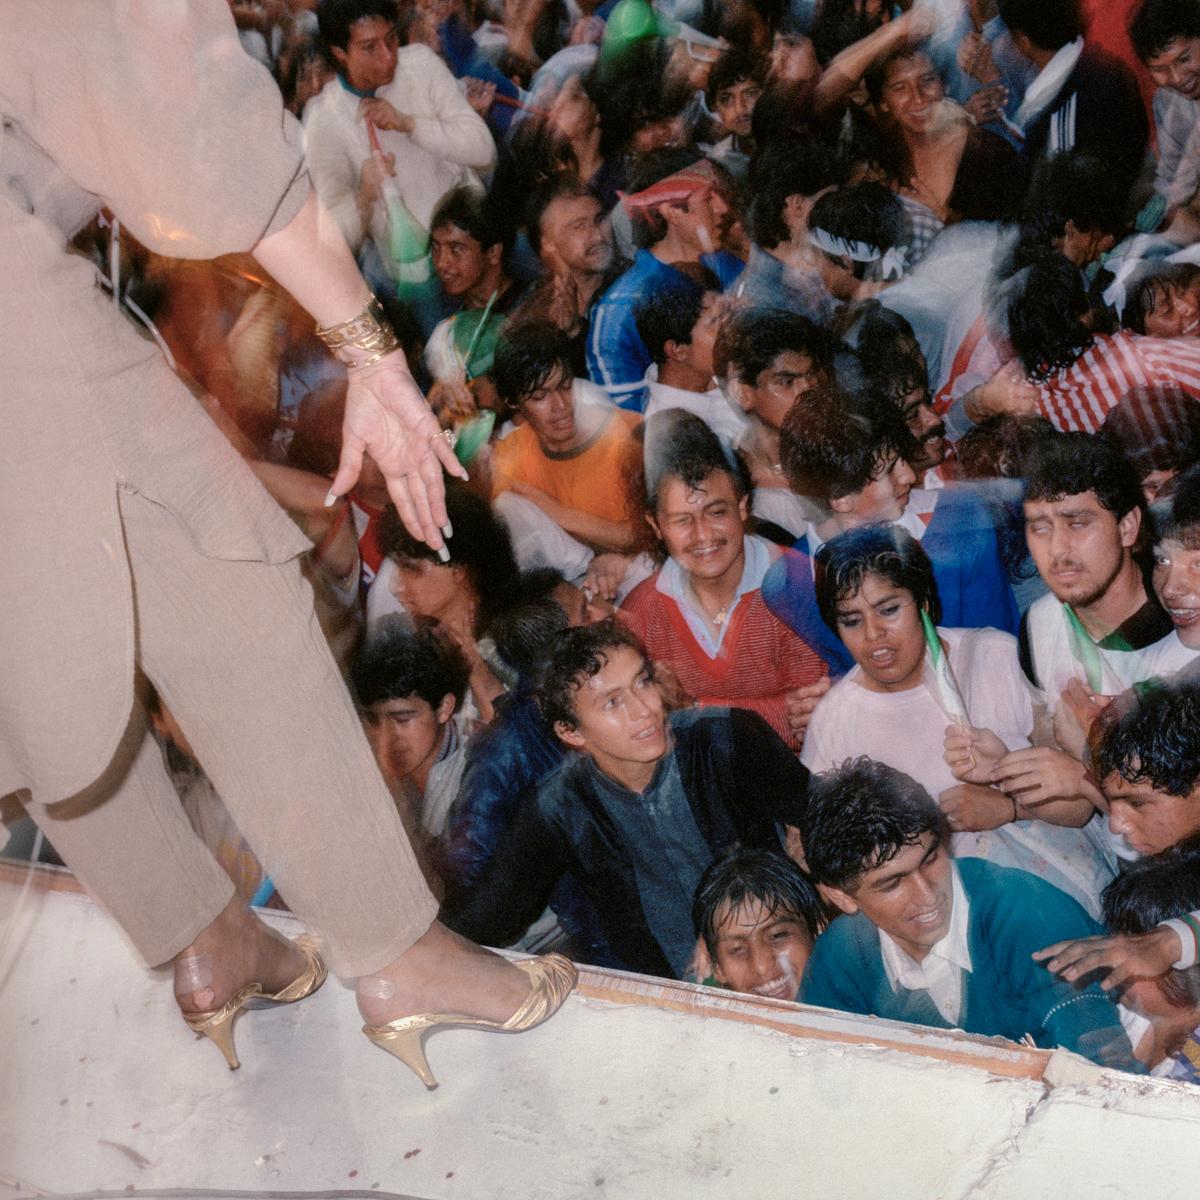 Street Performer, México City 1986